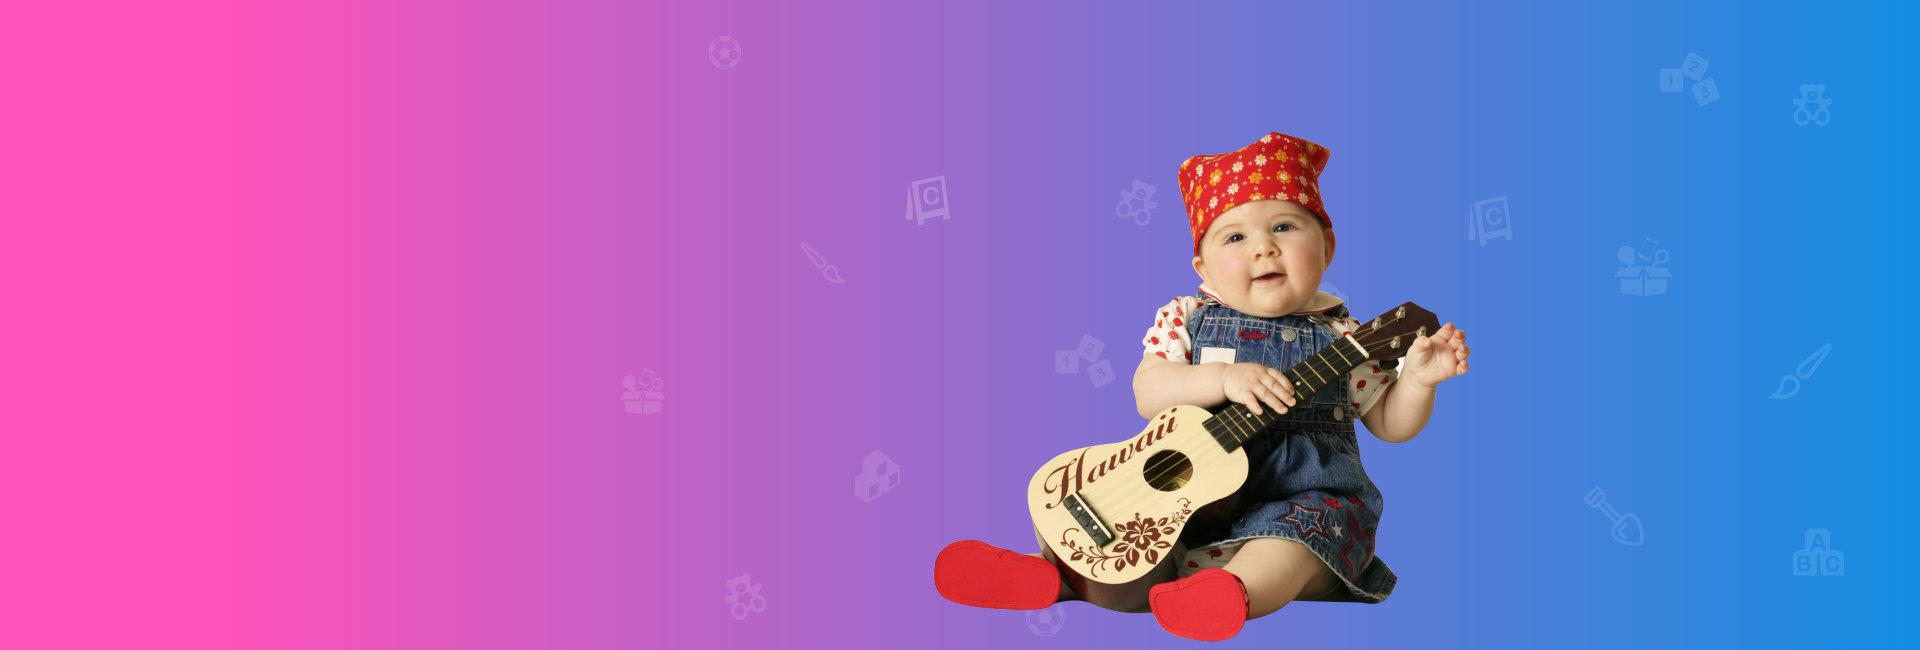 infant holding a guitar